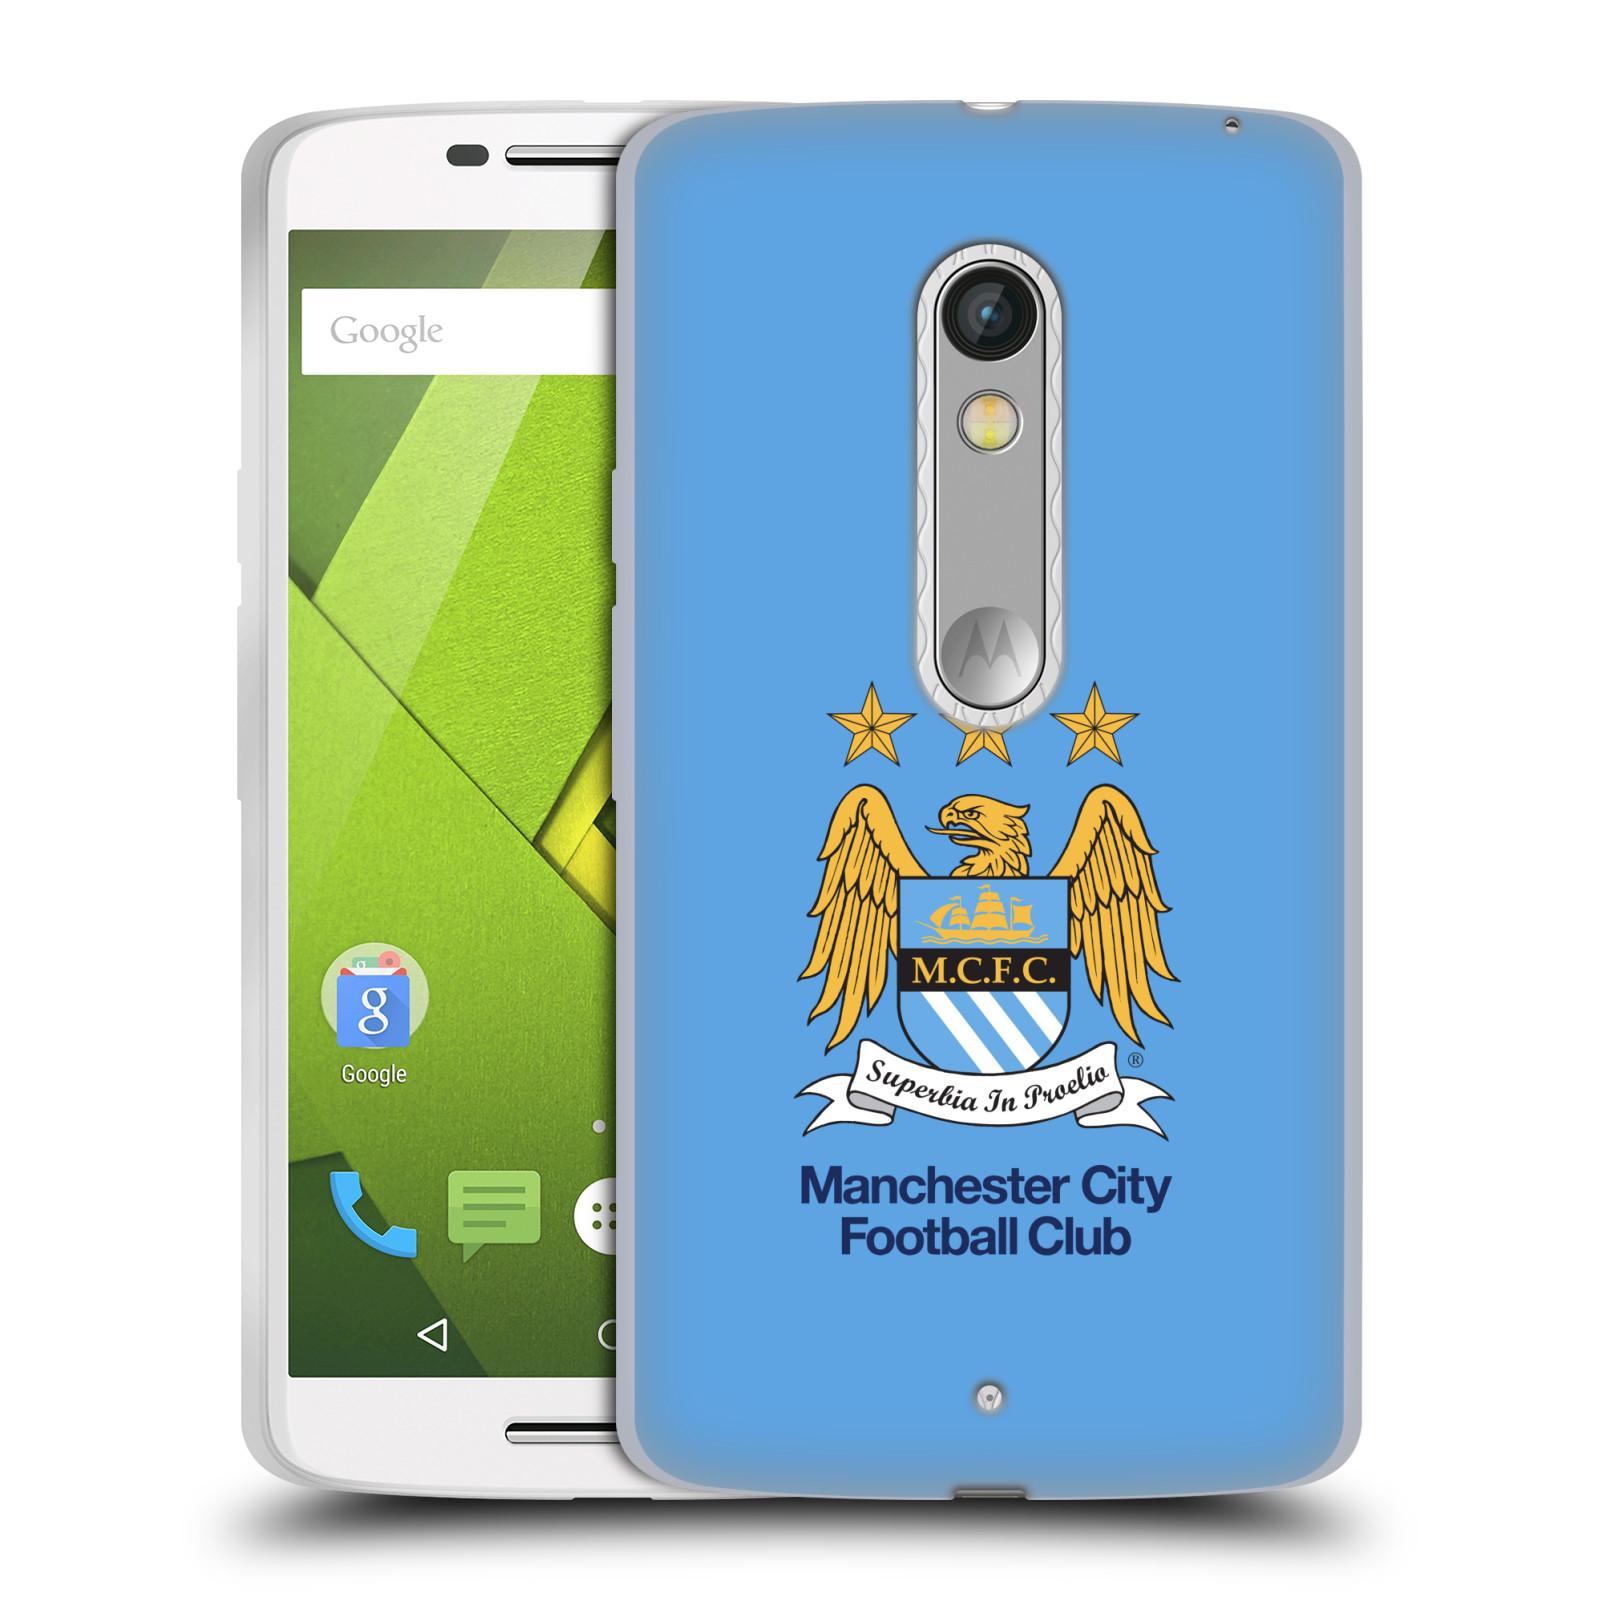 HEAD CASE silikonový obal na mobil Lenovo Moto X PLAY Fotbalový klub Manchester City nebesky modrá pozadí velký znak pták